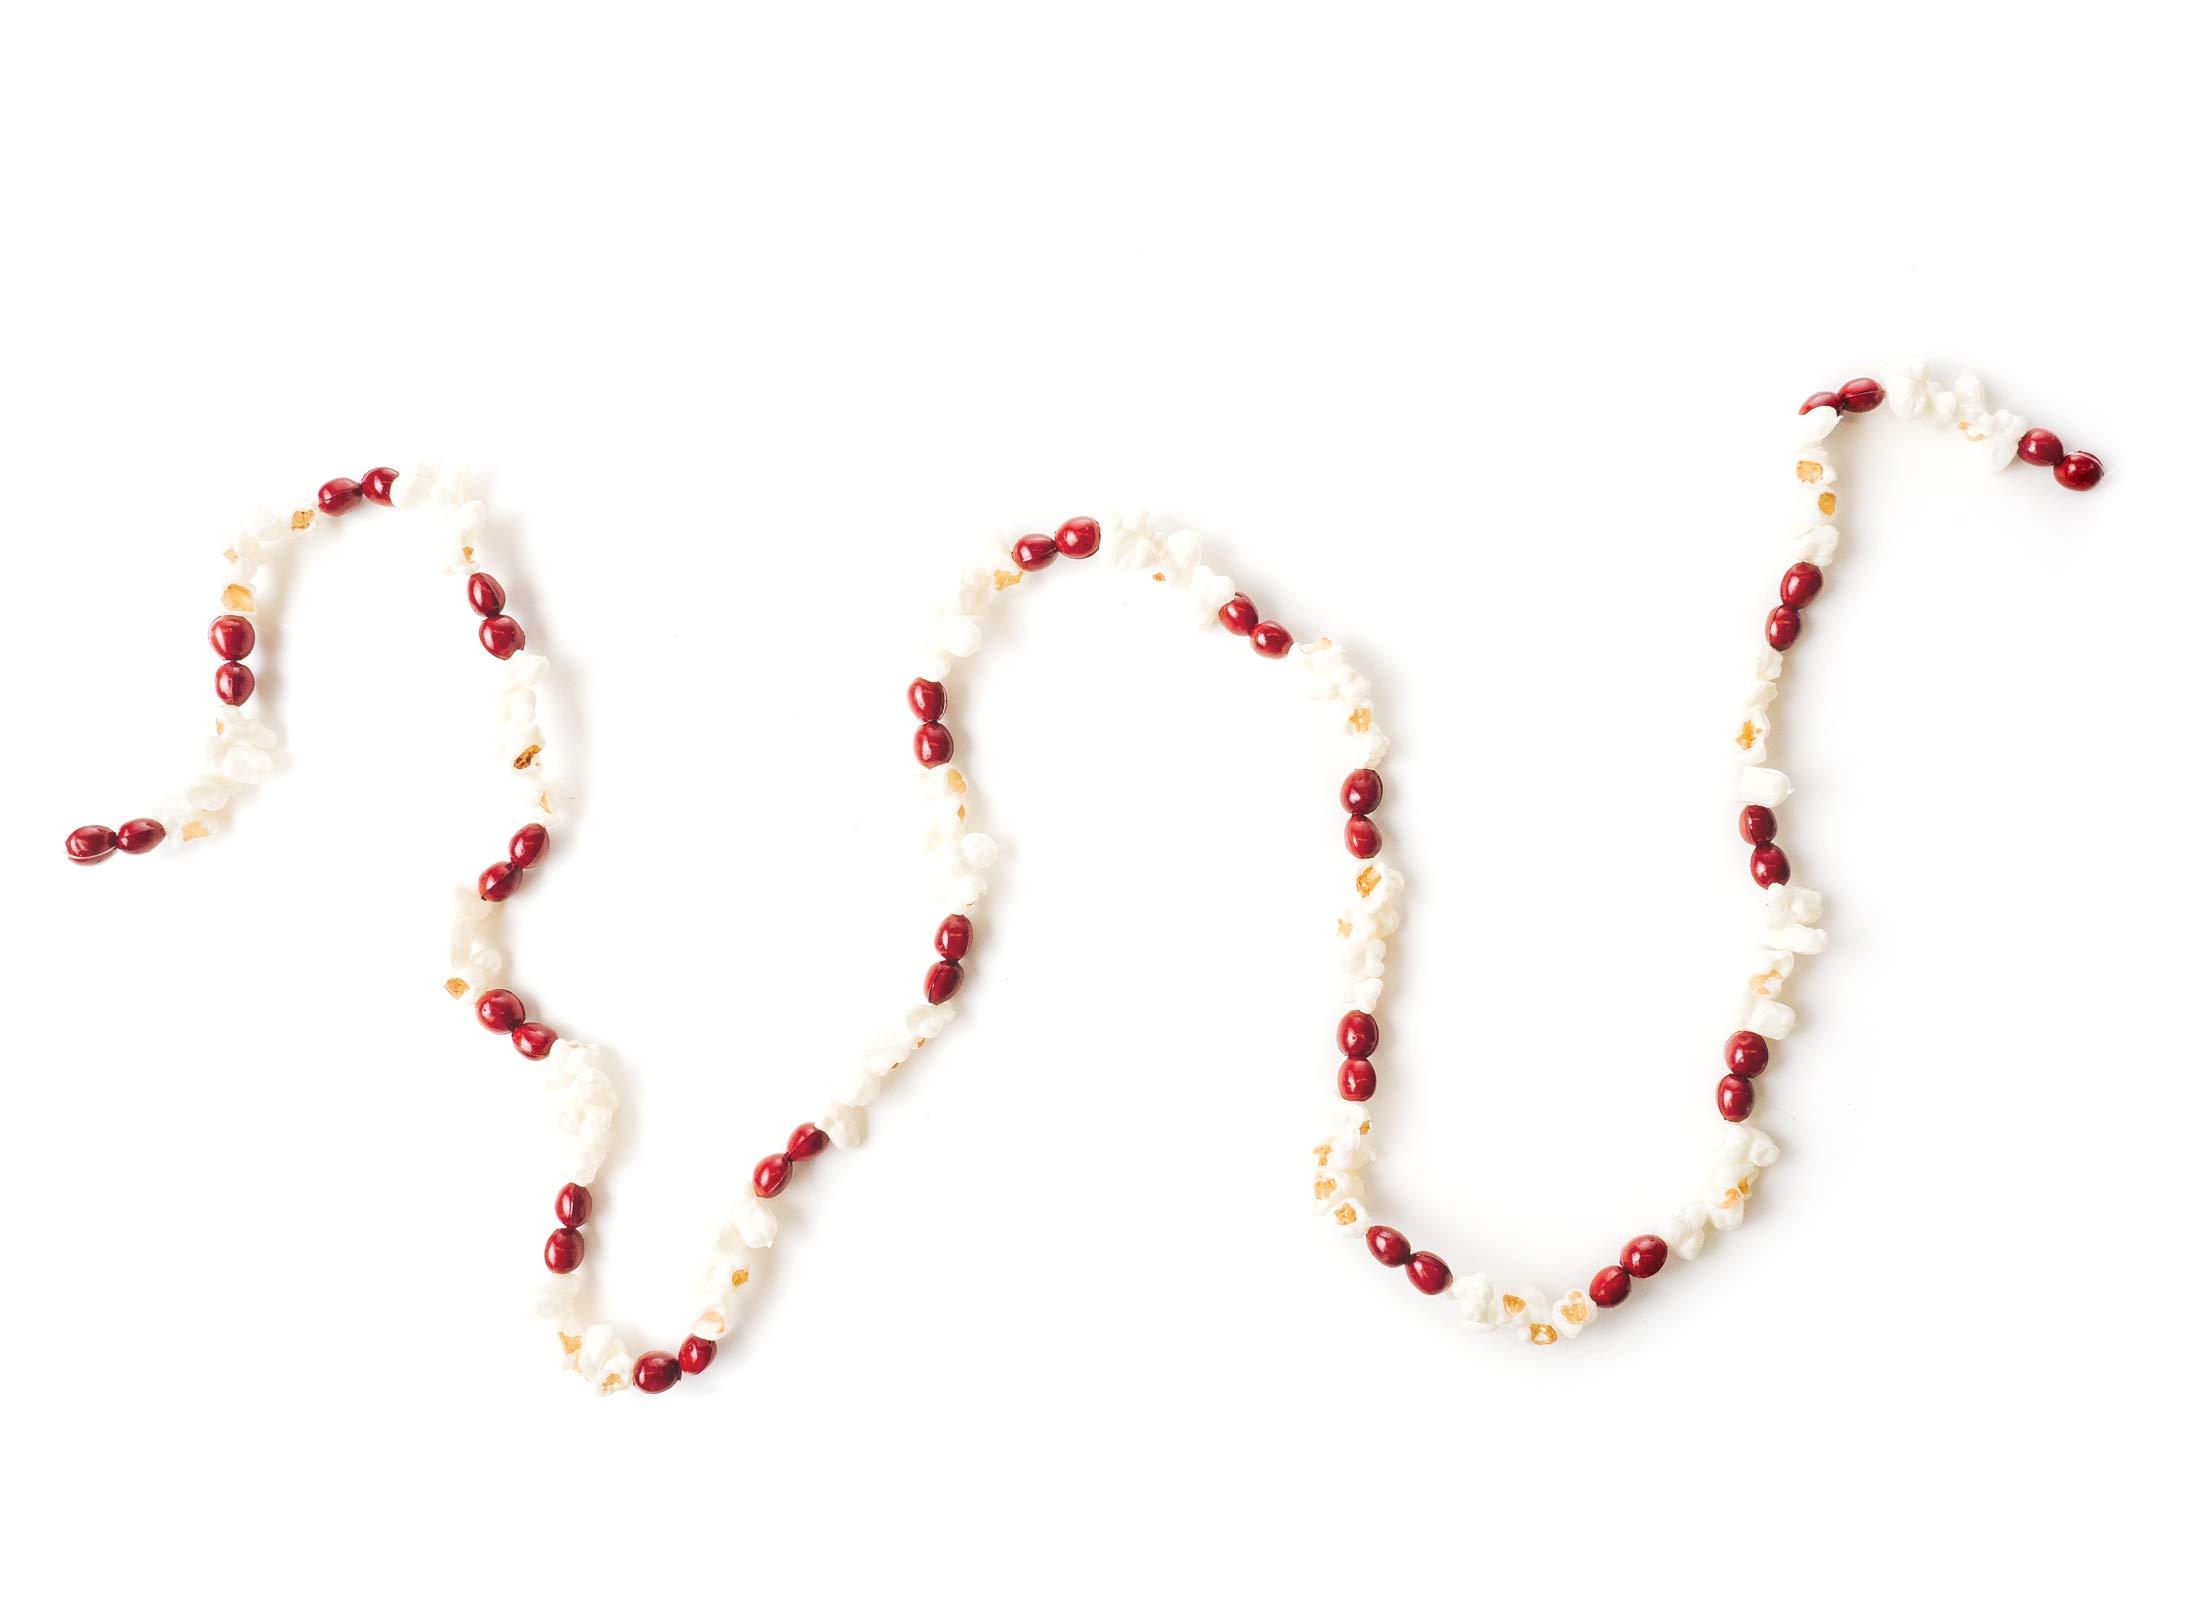 silk flower arrangements craftmore popcorn and cranberry plastic garland